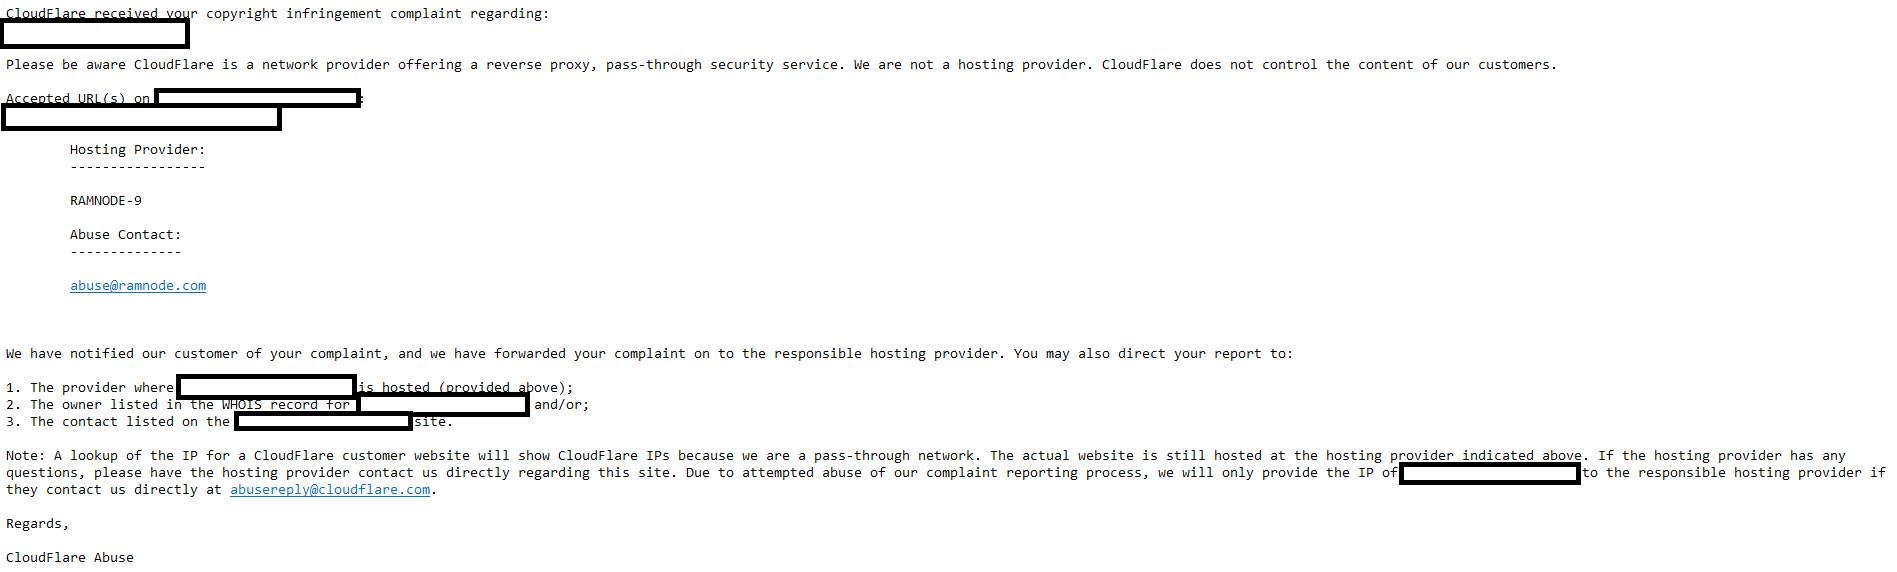 cloudflare response